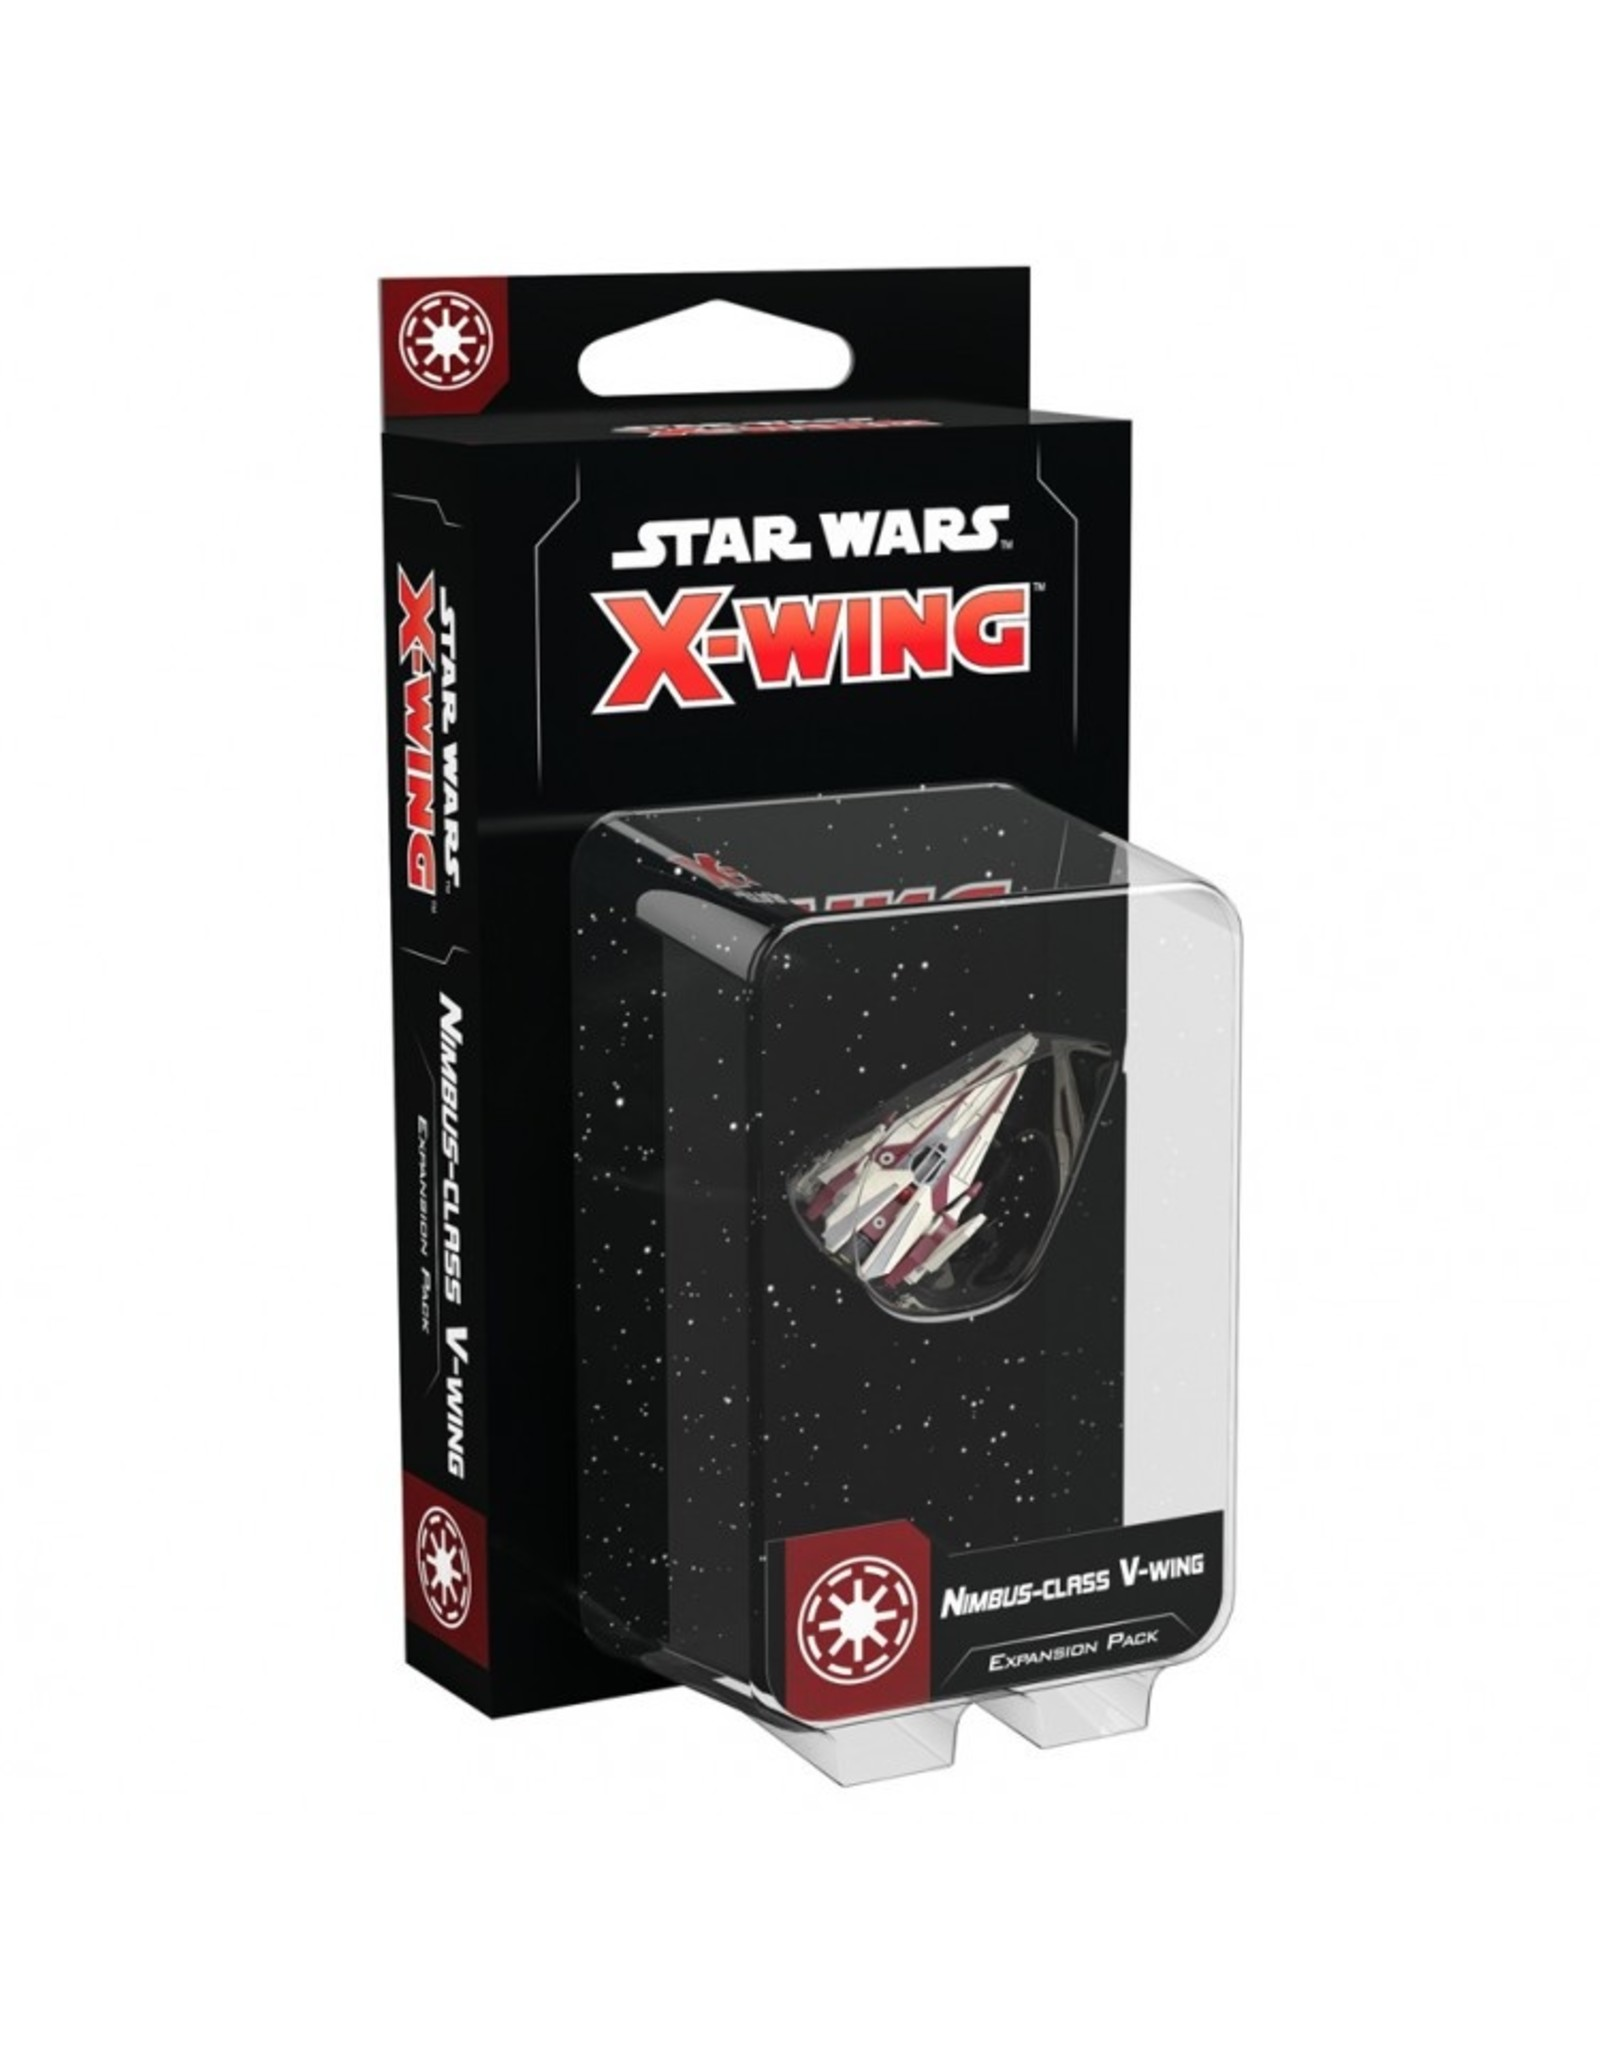 Atomic Mass Games Star Wars X-Wing 2nd Ed: Nimbus-class V-wing